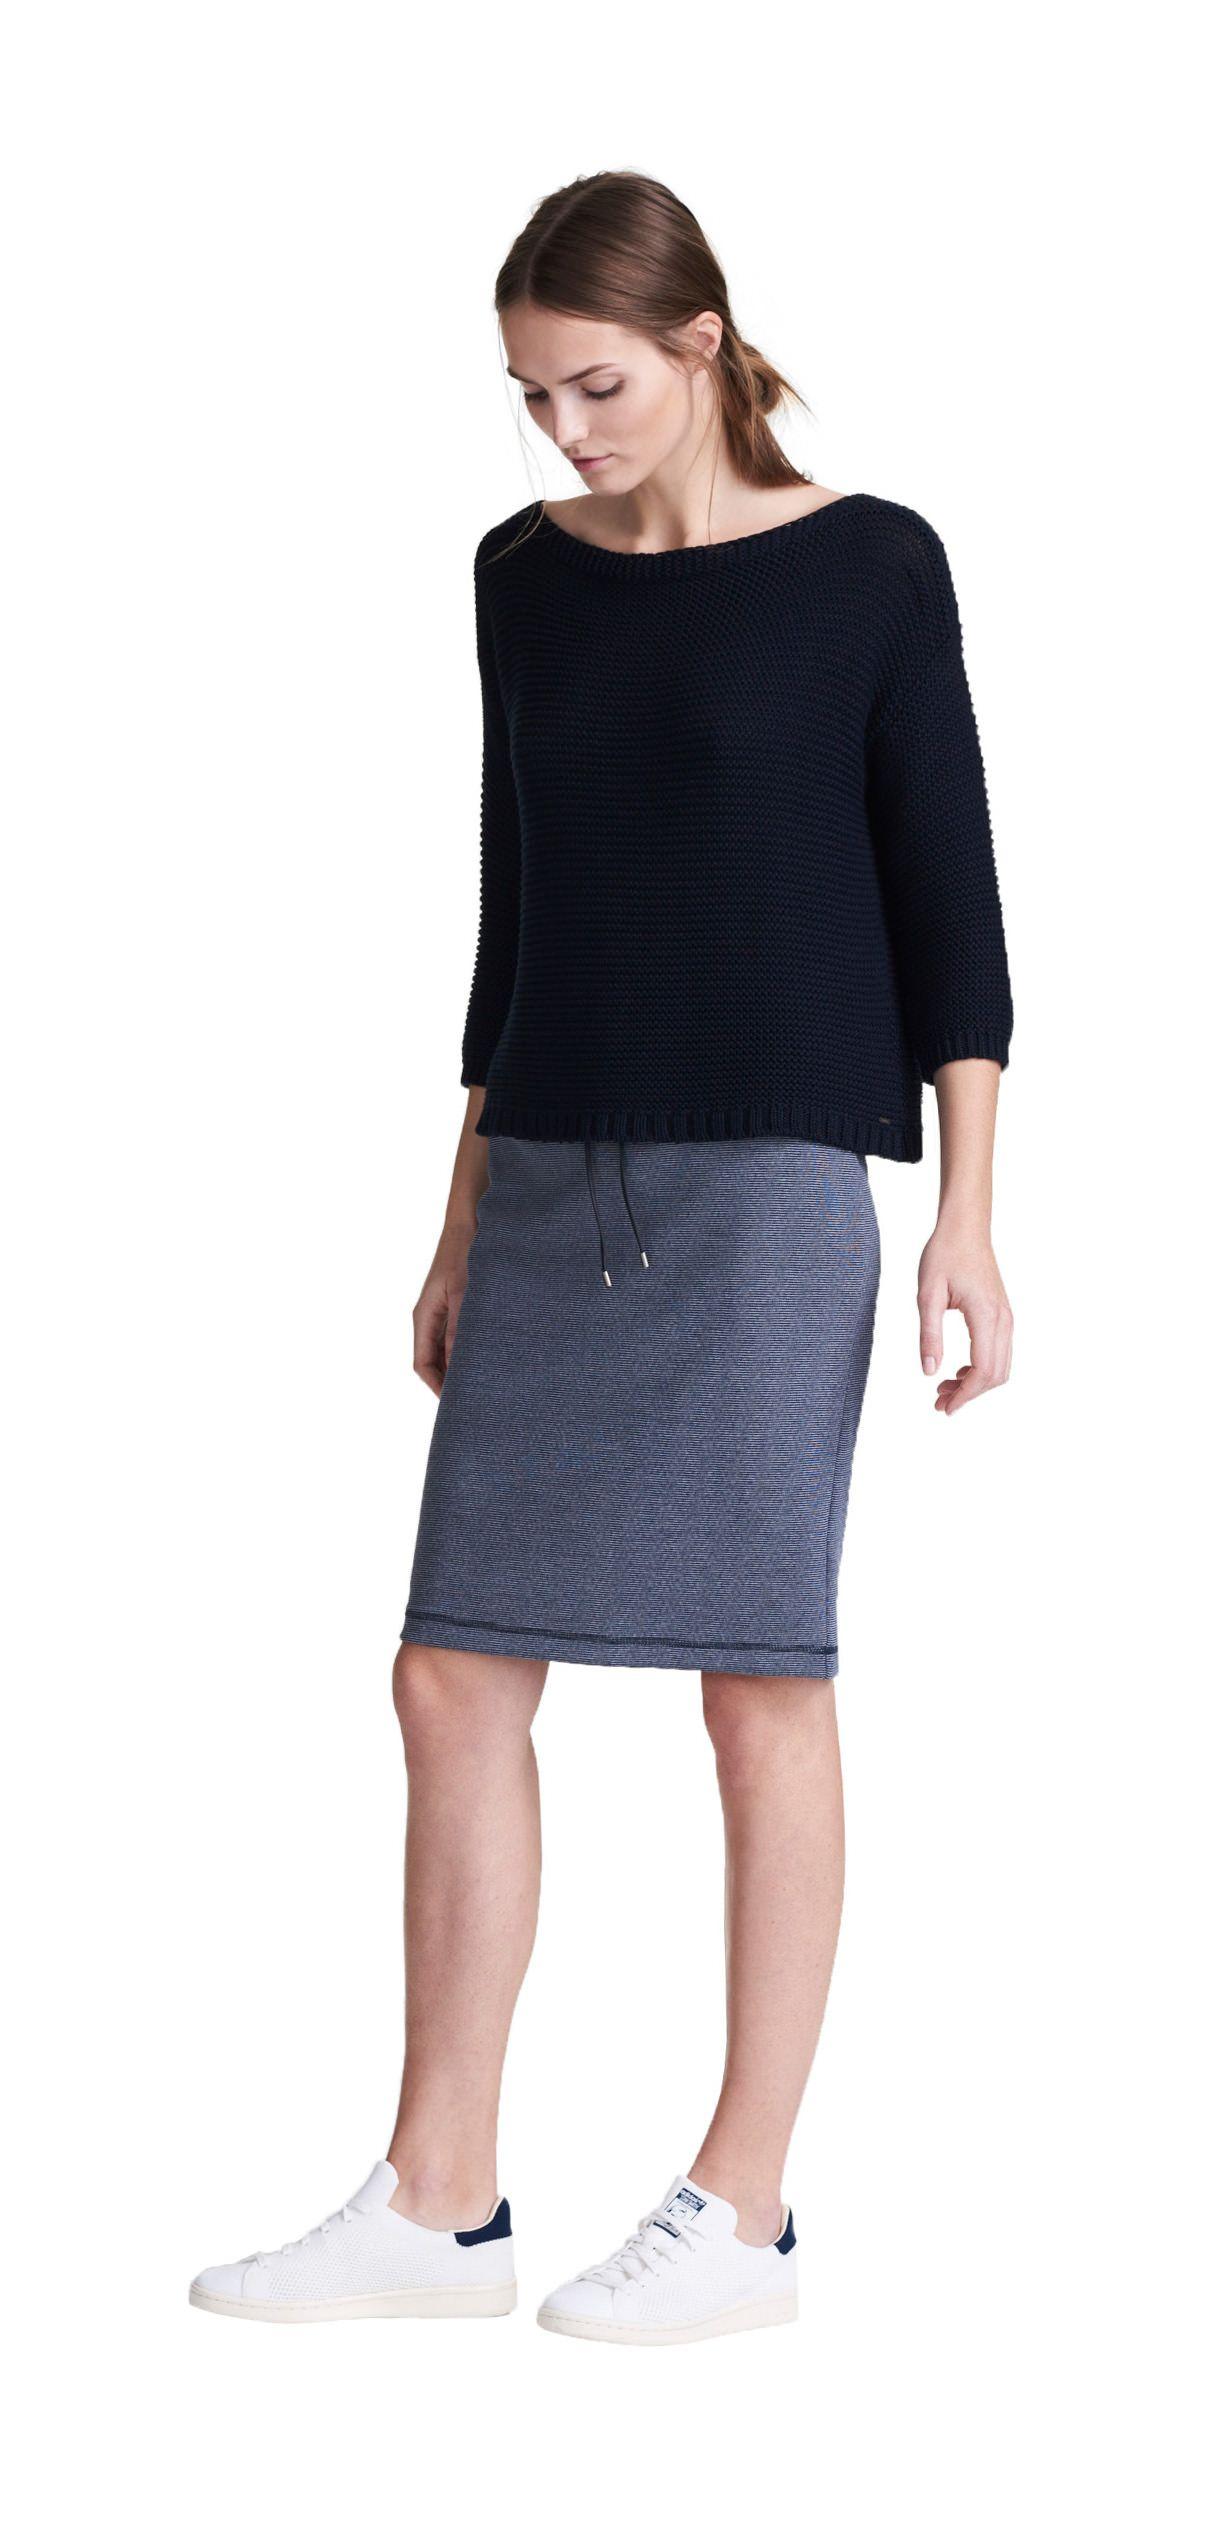 wholesale dealer 00d19 8832e Damen Outfit Sportlich femininer Look von OPUS Fashion ...